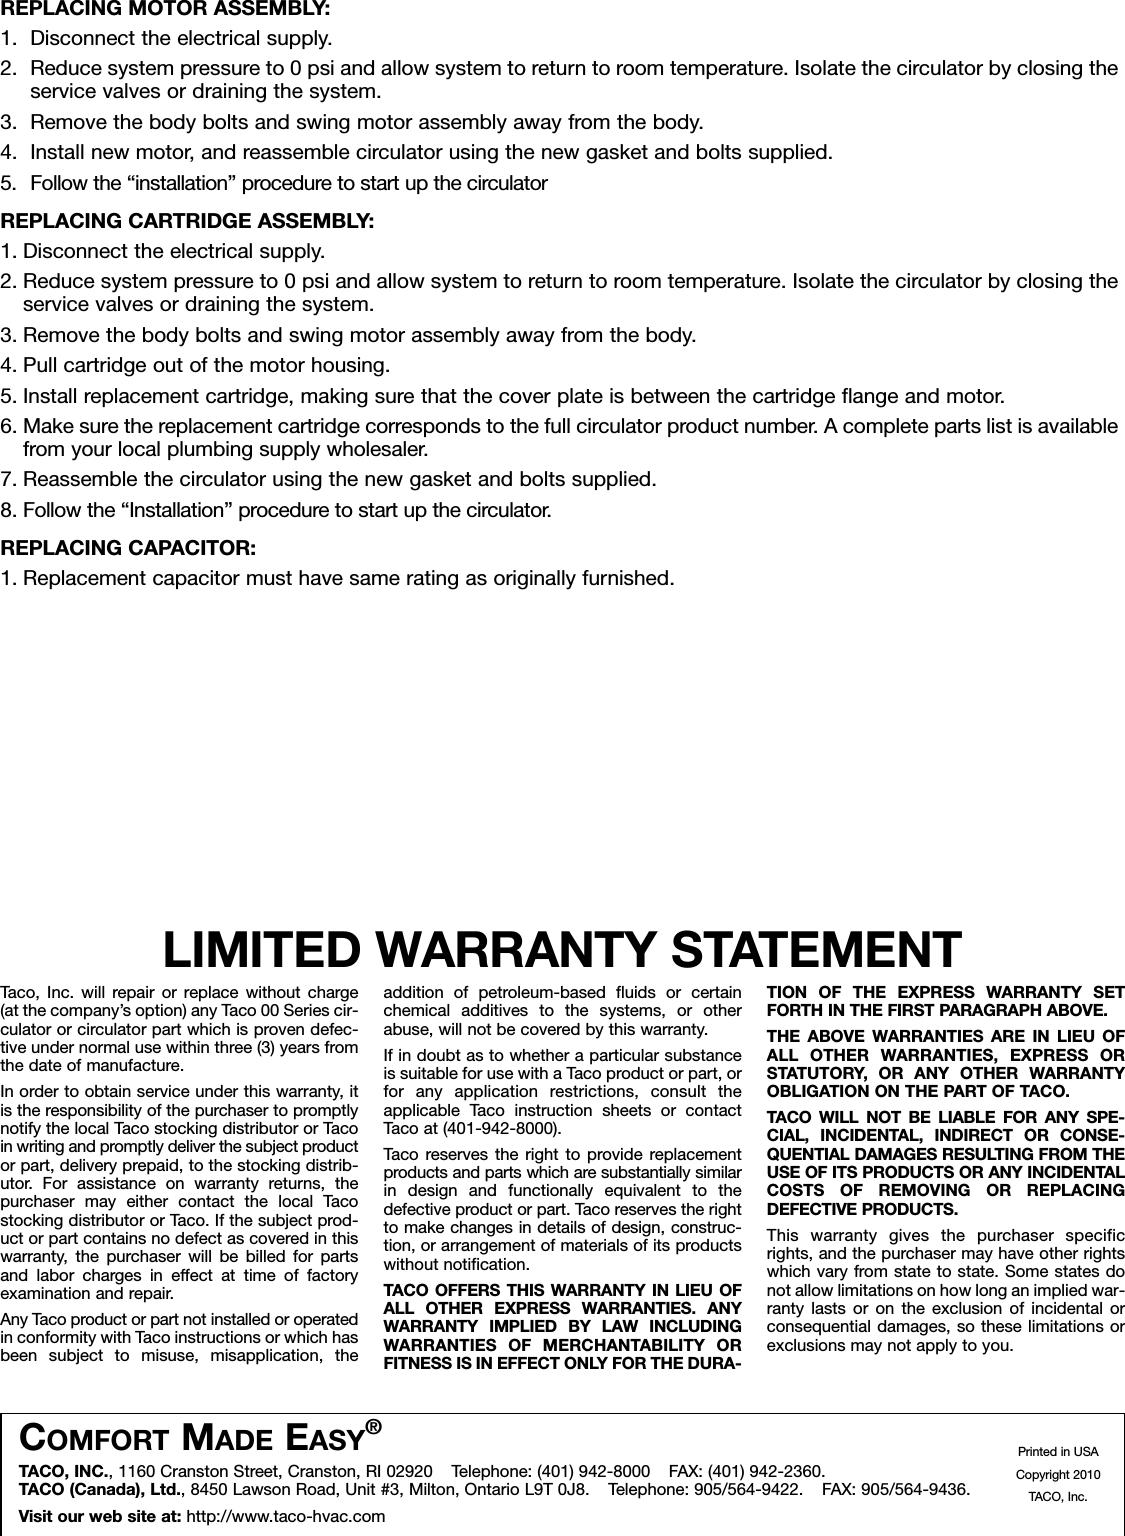 12508 3 Taco 0014 F1 1Ifc Instructions Assem1 Sheet1 User Manual